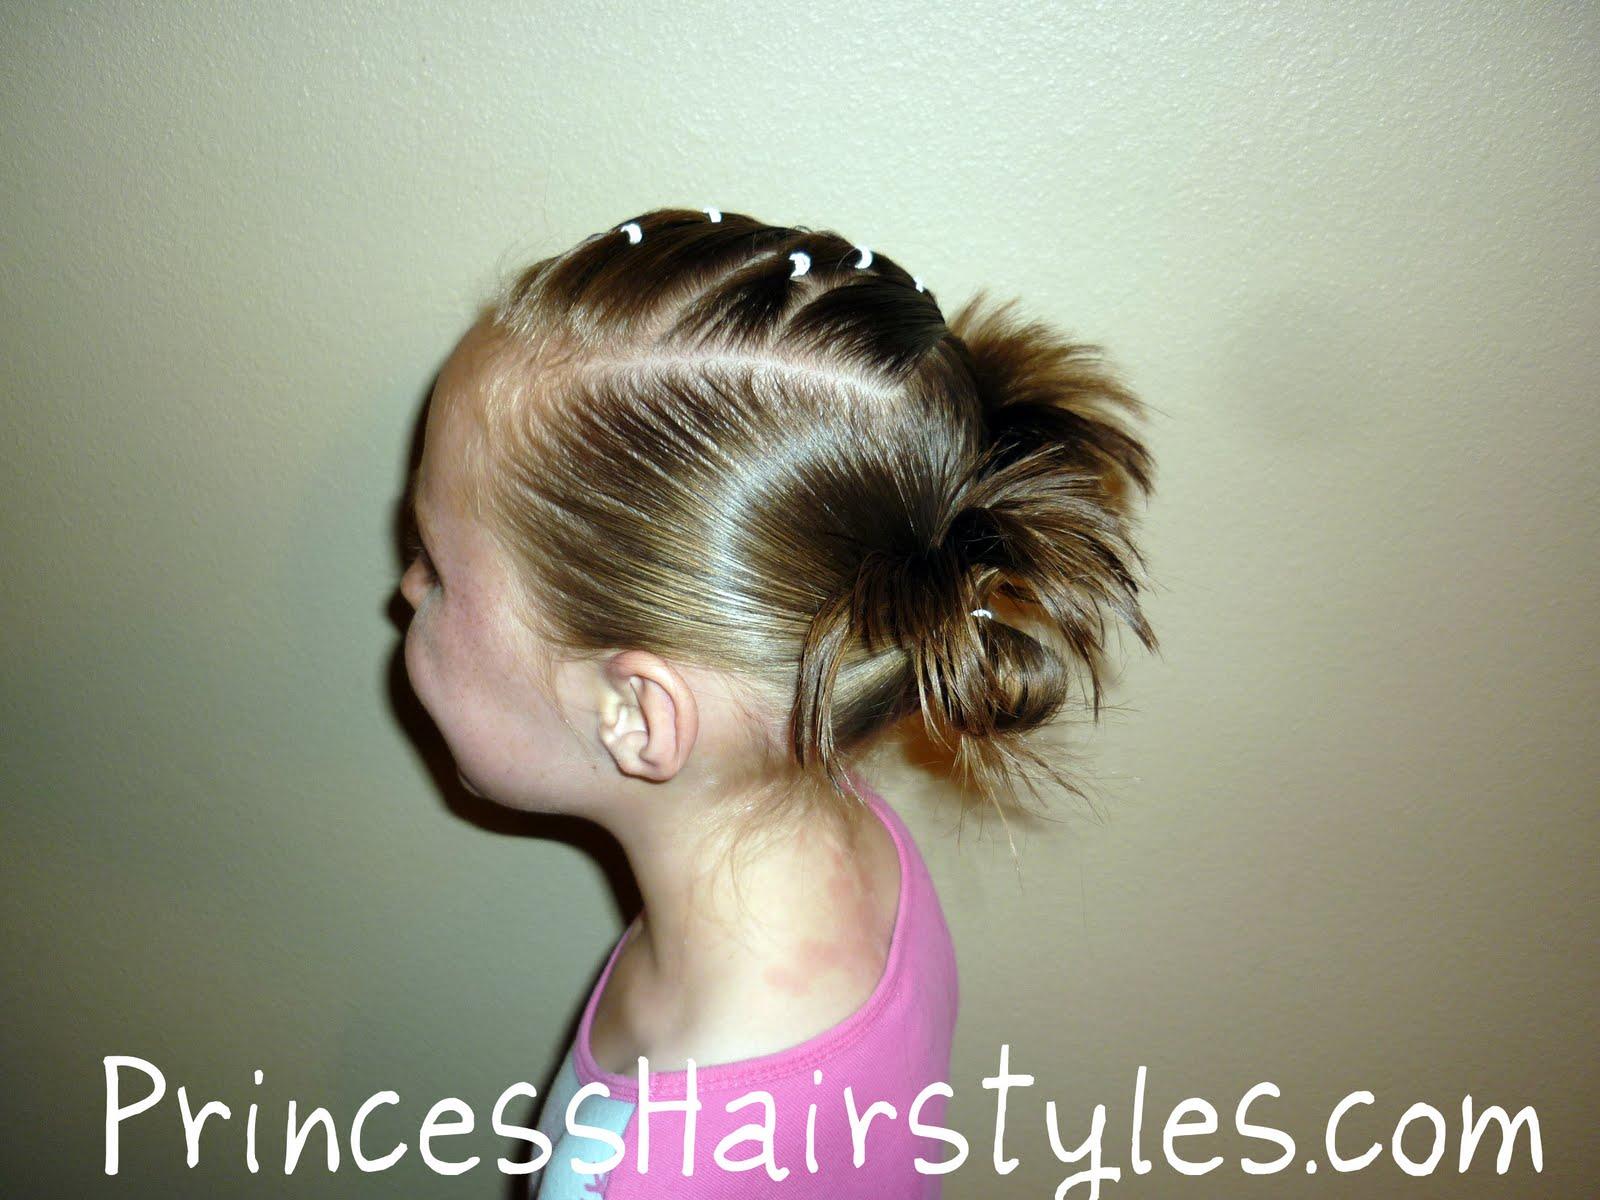 Remarkable Chutes And Ladders Hairdo Hairstyles For Girls Princess Hairstyles Hairstyles For Men Maxibearus